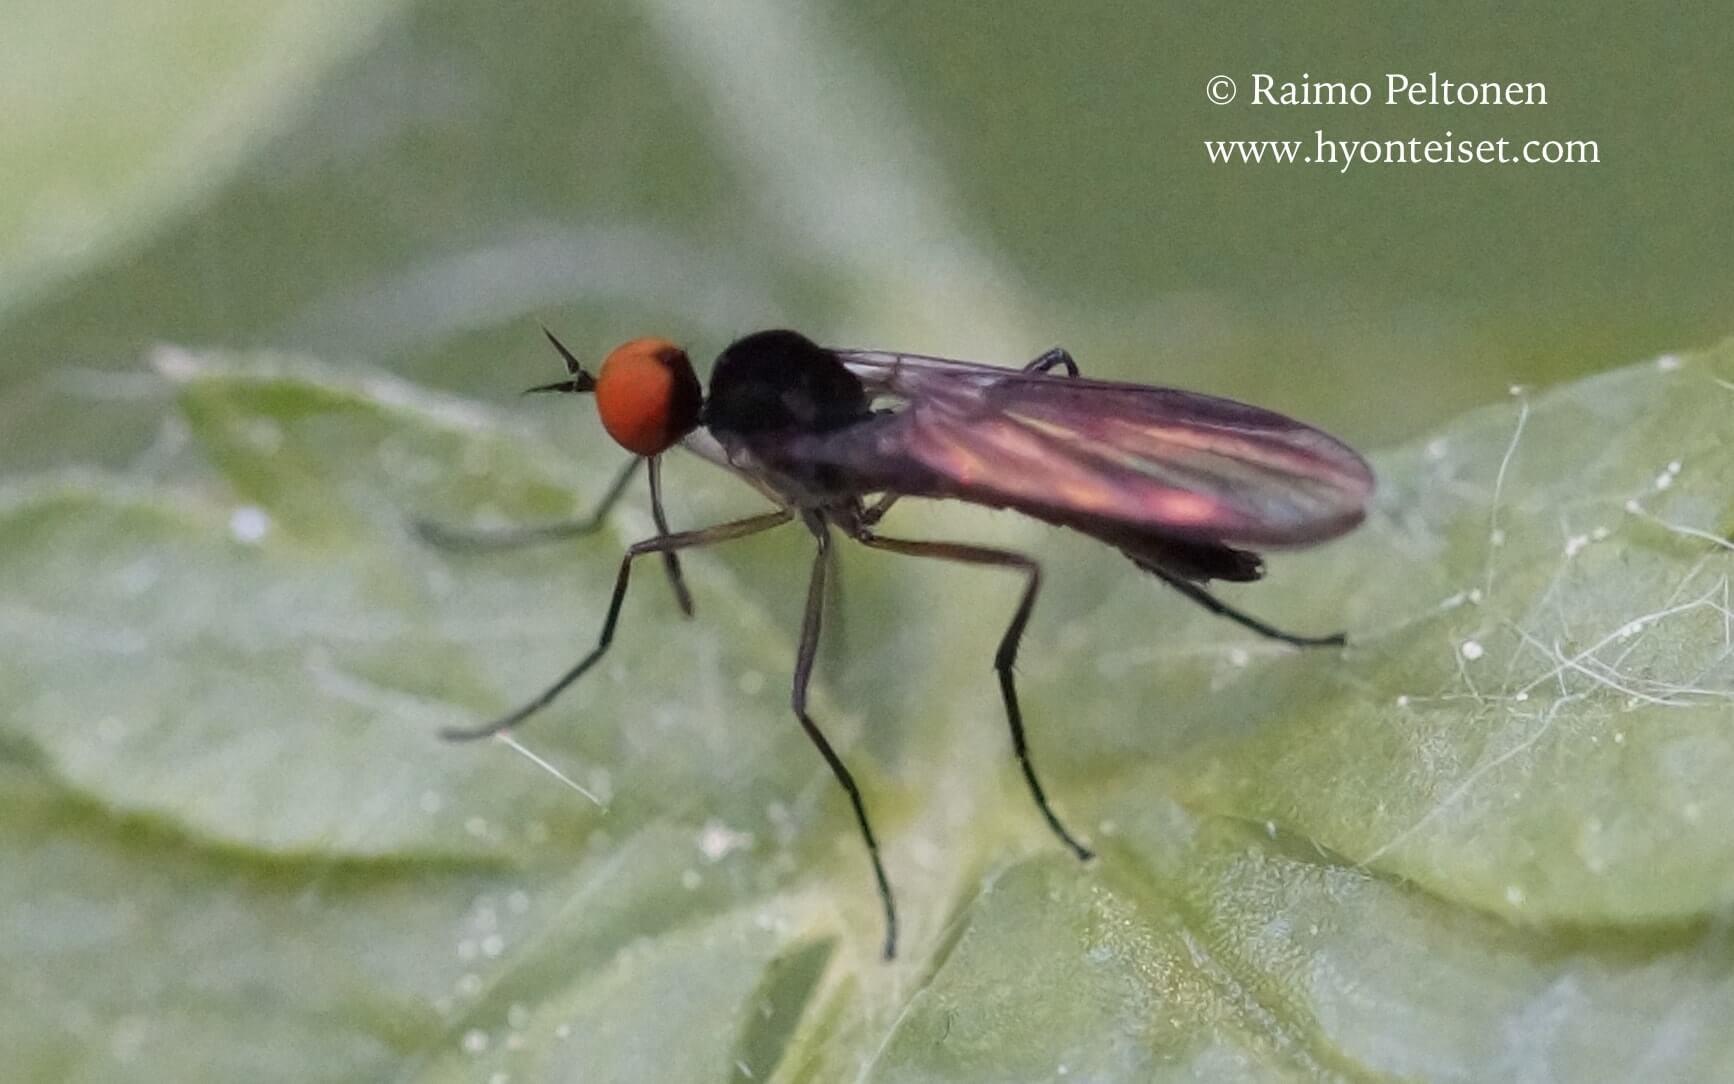 Rhamphomyia nigripennis group (det. Paul Beuk), 22.8.2015 Jyväskylä